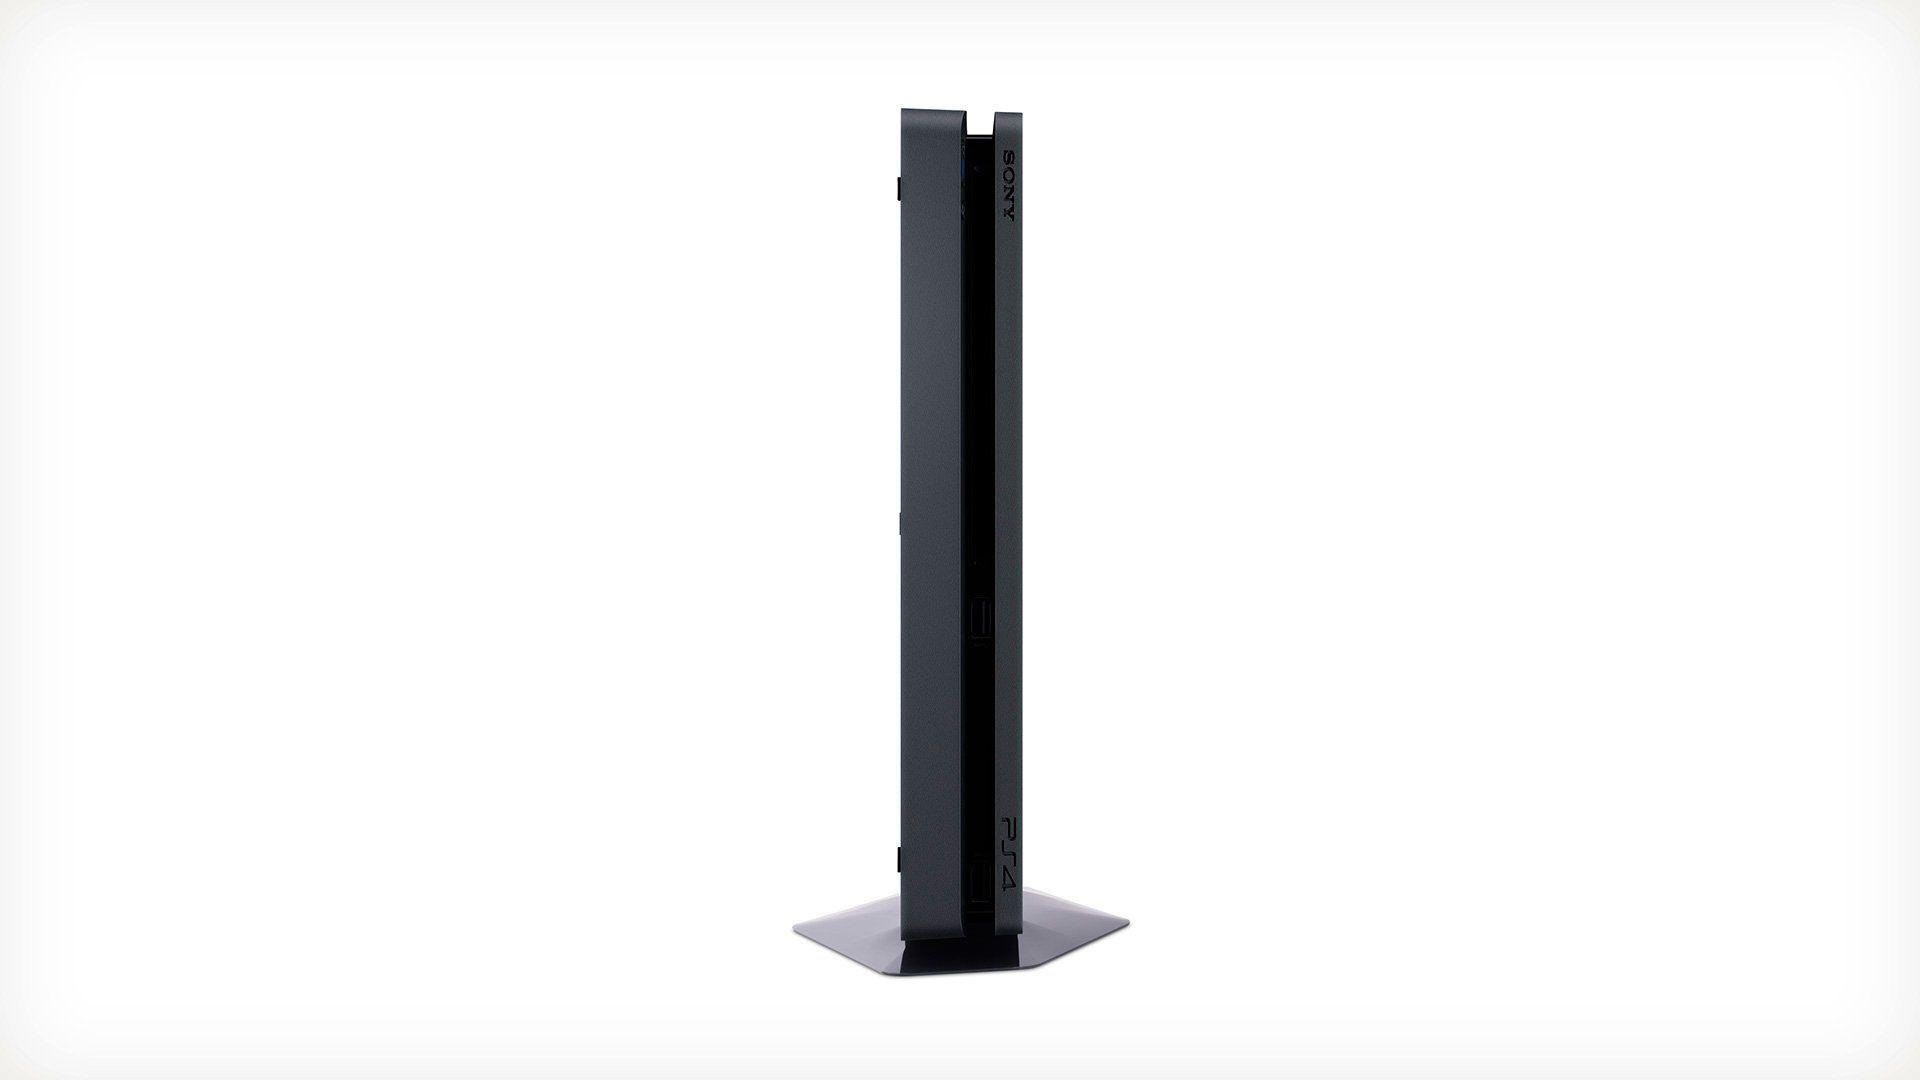 PlayStation 4 Slim 500Gb FIFA 17 и 2 джойстика изображение 5